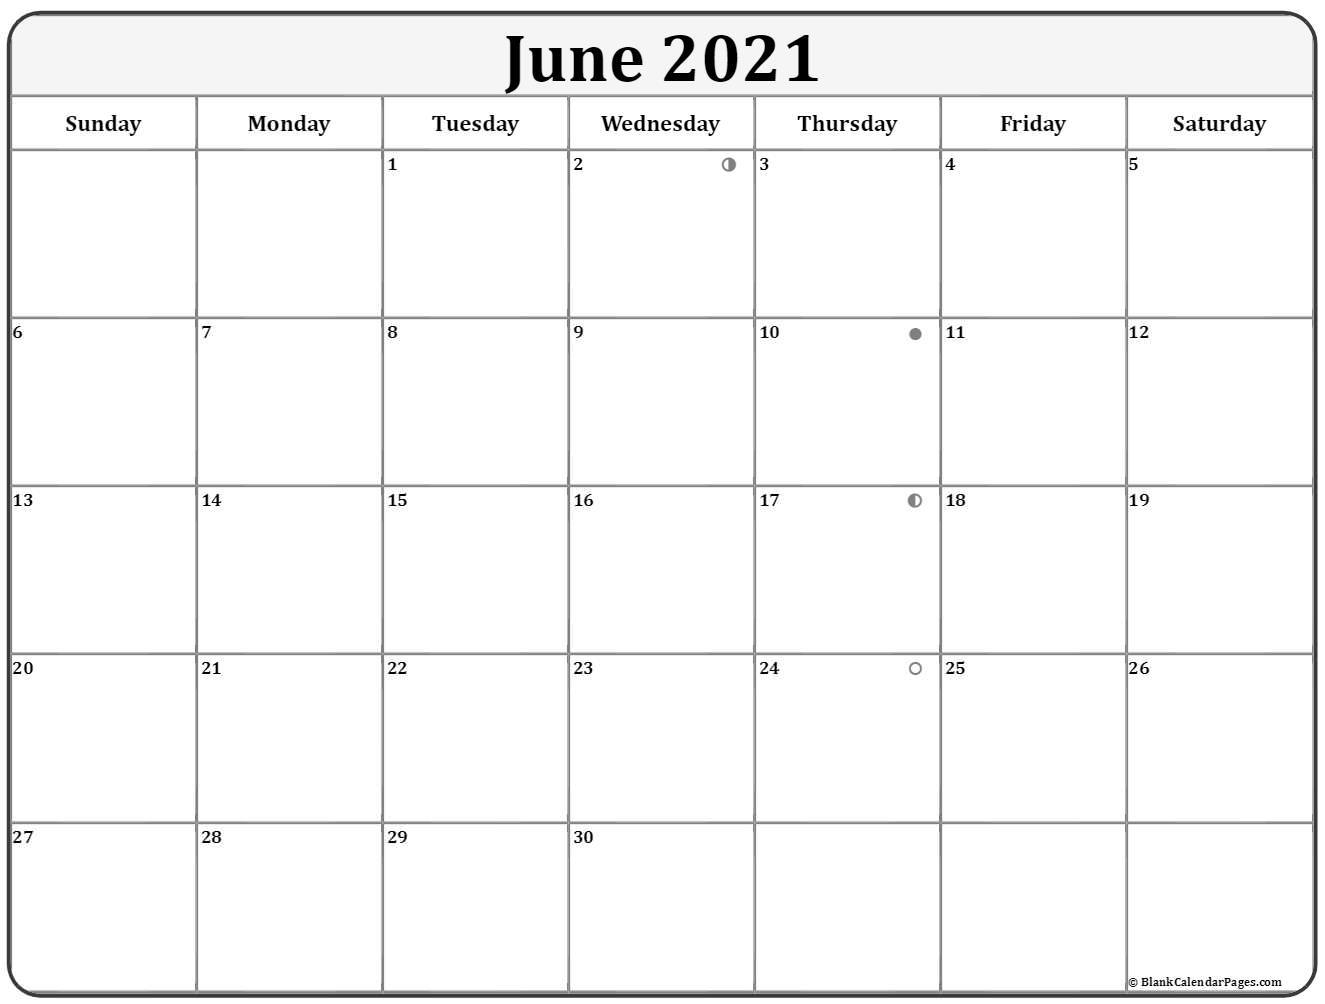 Free Printable 2021 Lunar Calendar : November 2021 Lunar